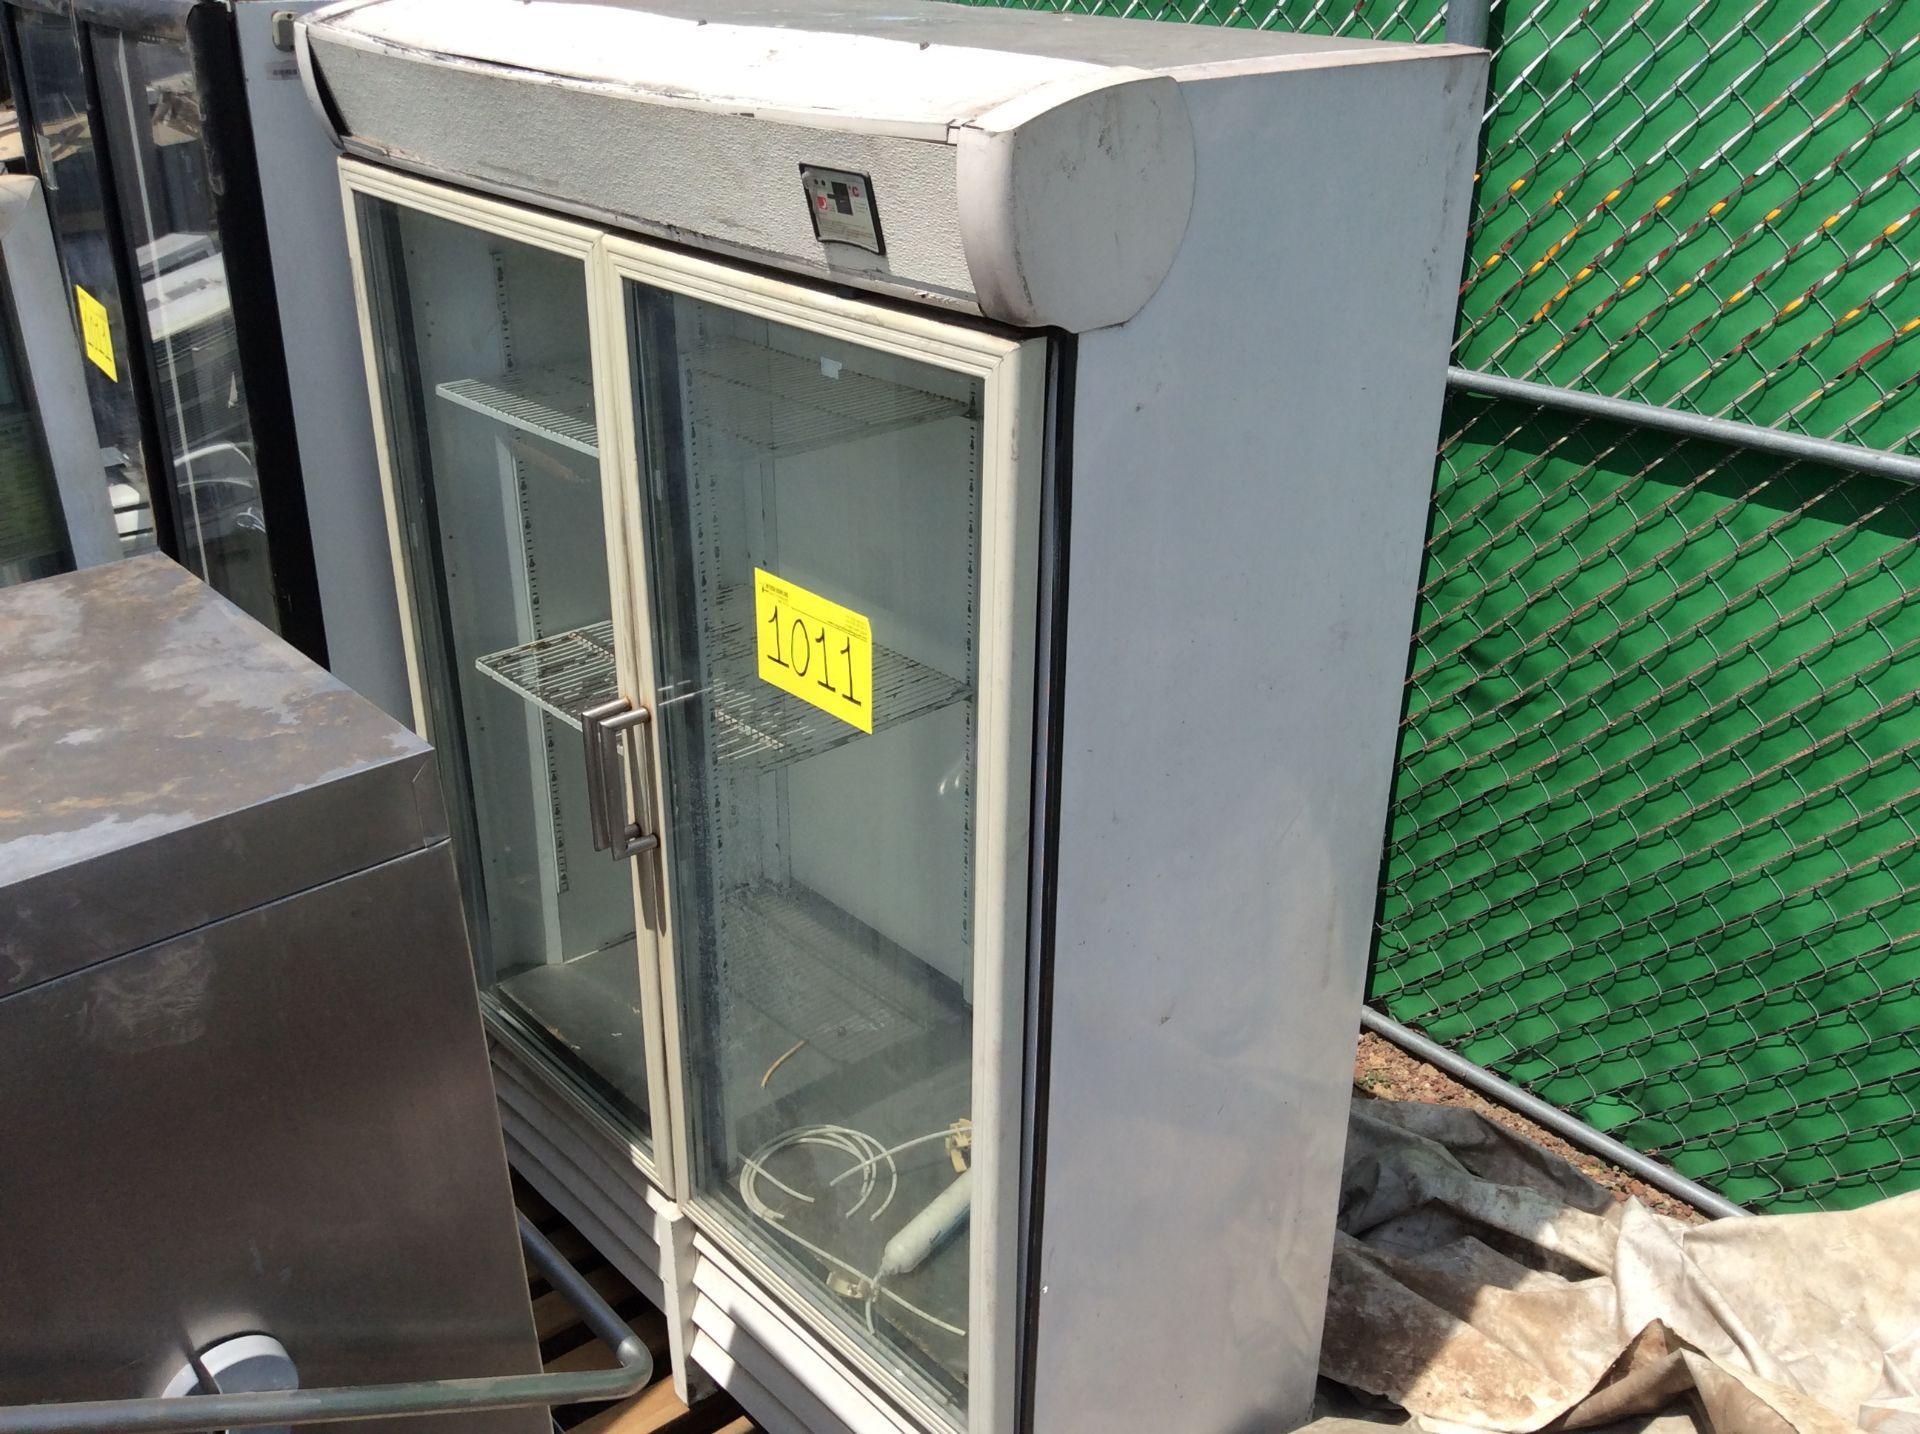 1 Ojeda refrigerator of double glass door model RV2P36 serial number 0636323-34305 120V - Image 9 of 14